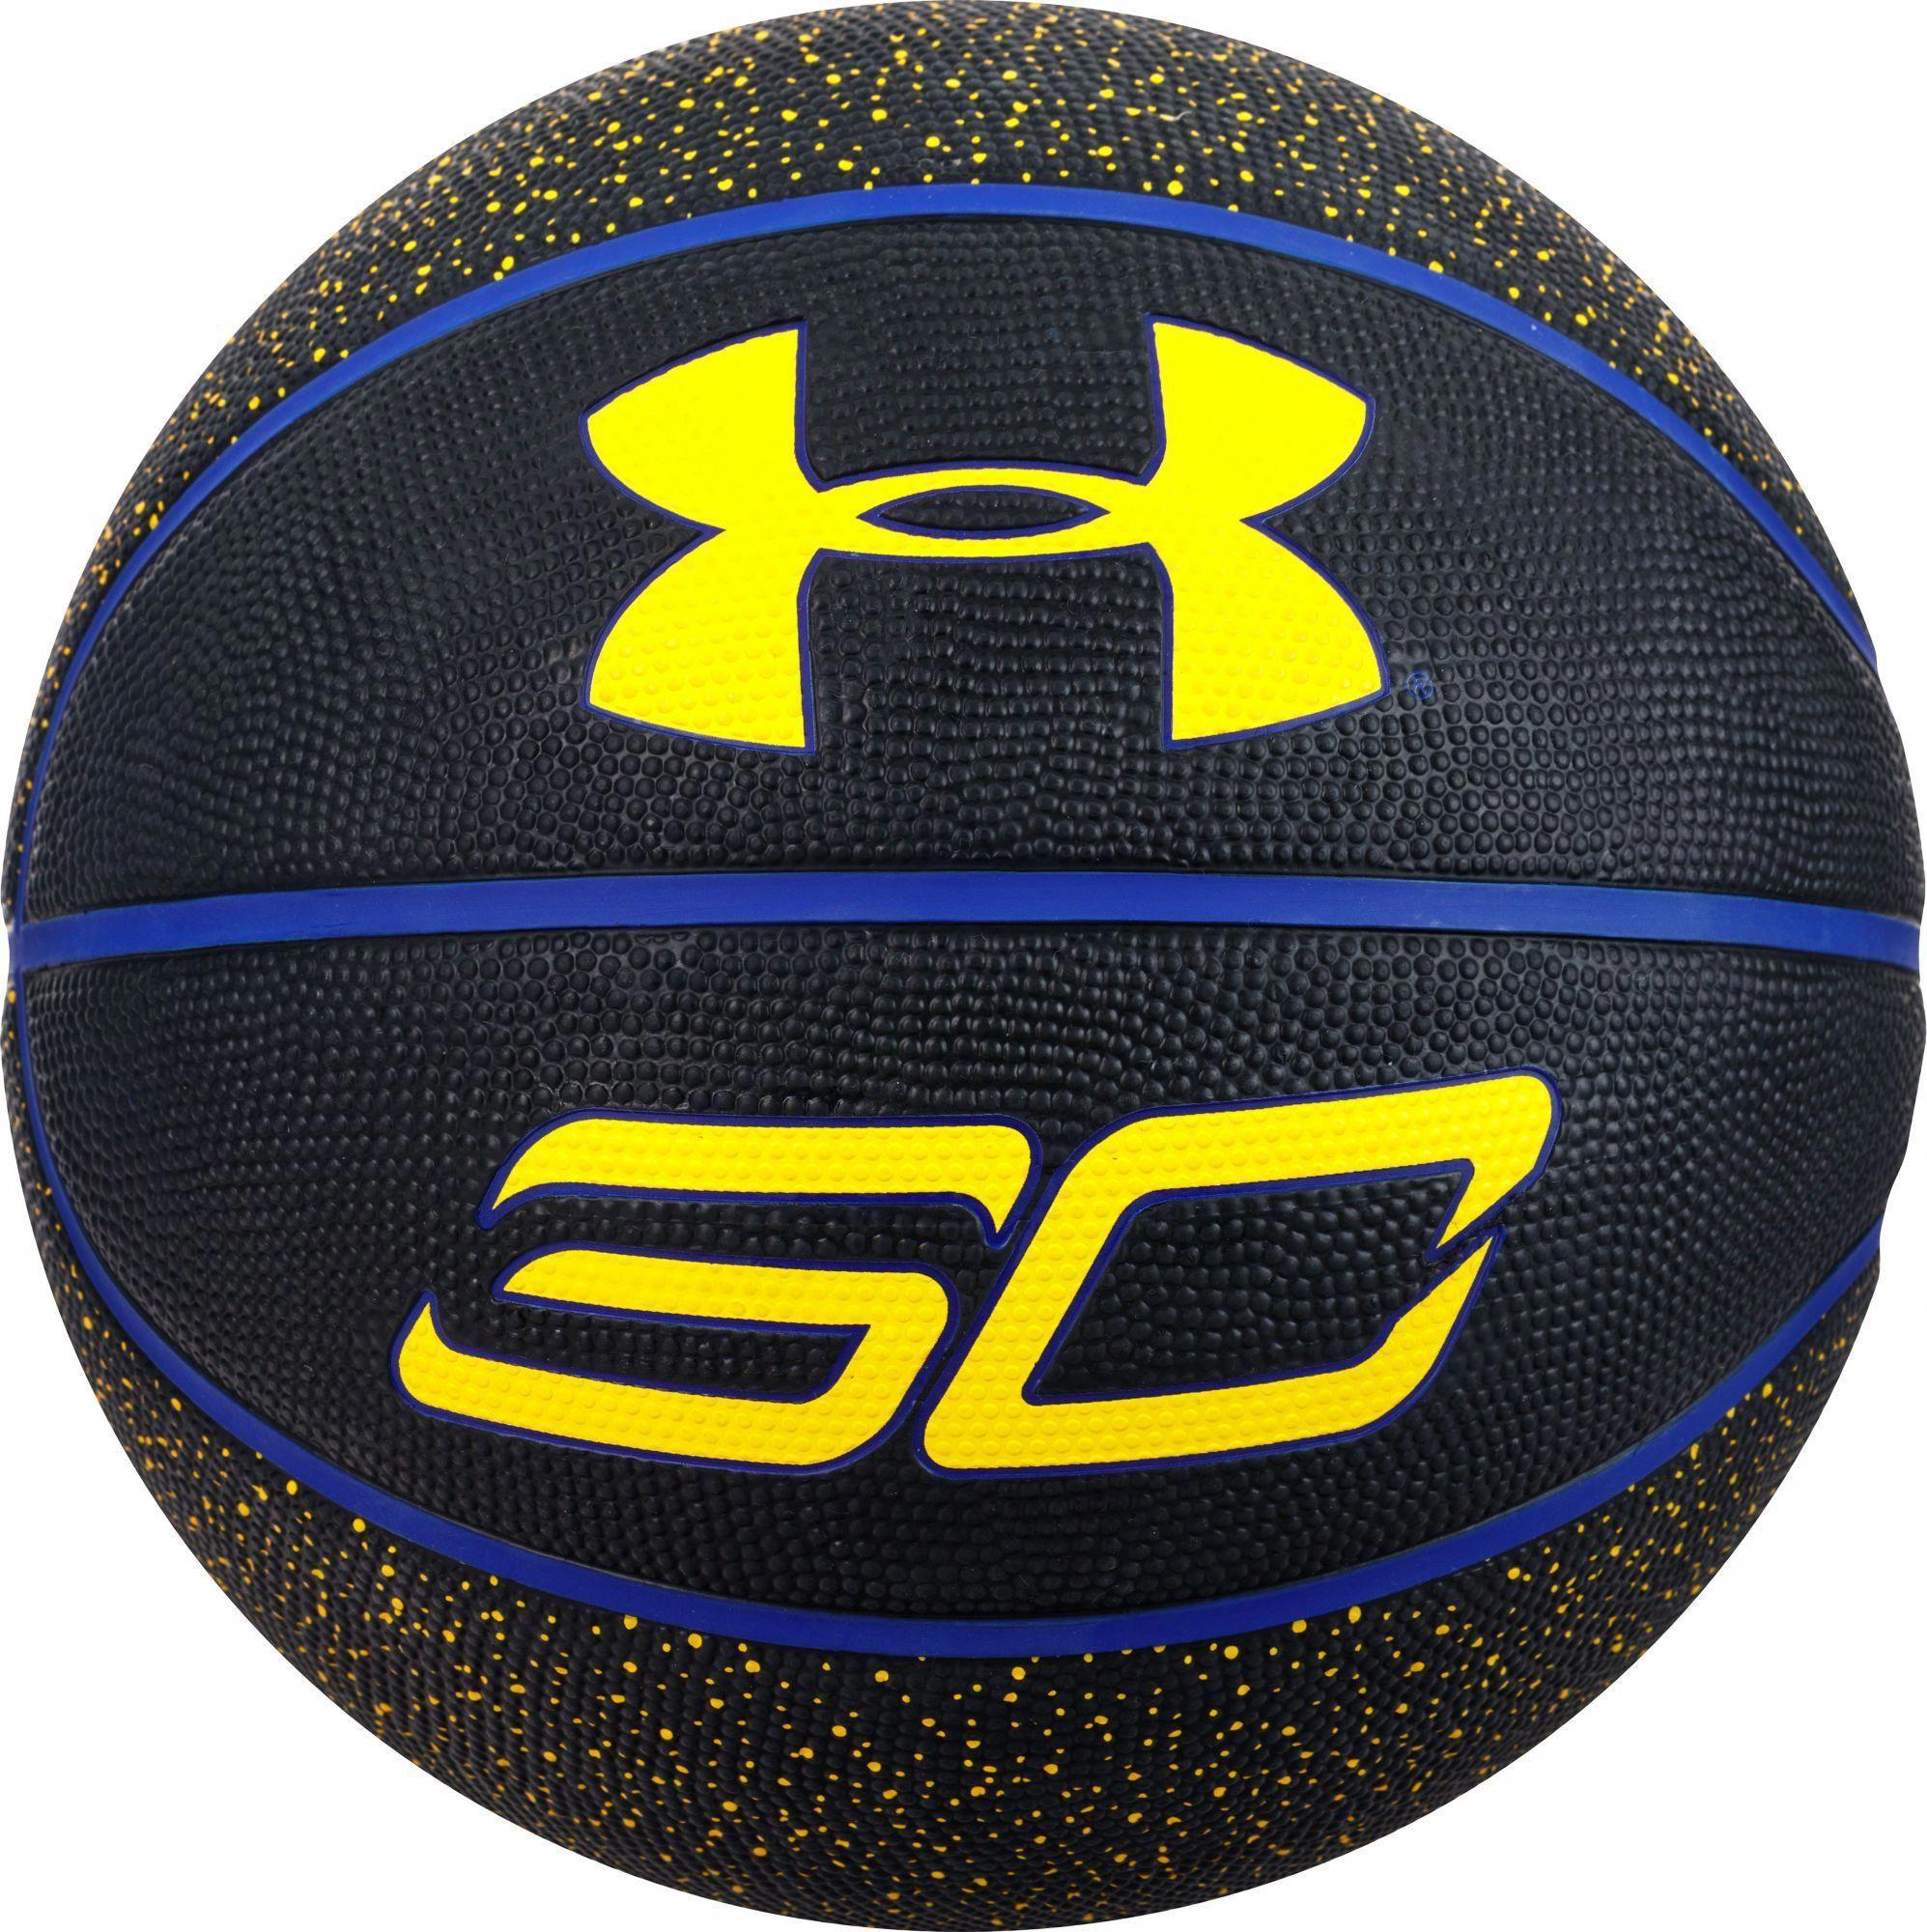 34edc0645e0 Under Armour Stephen Curry 2.5 Basketball (28.5)  streetbasketball ...